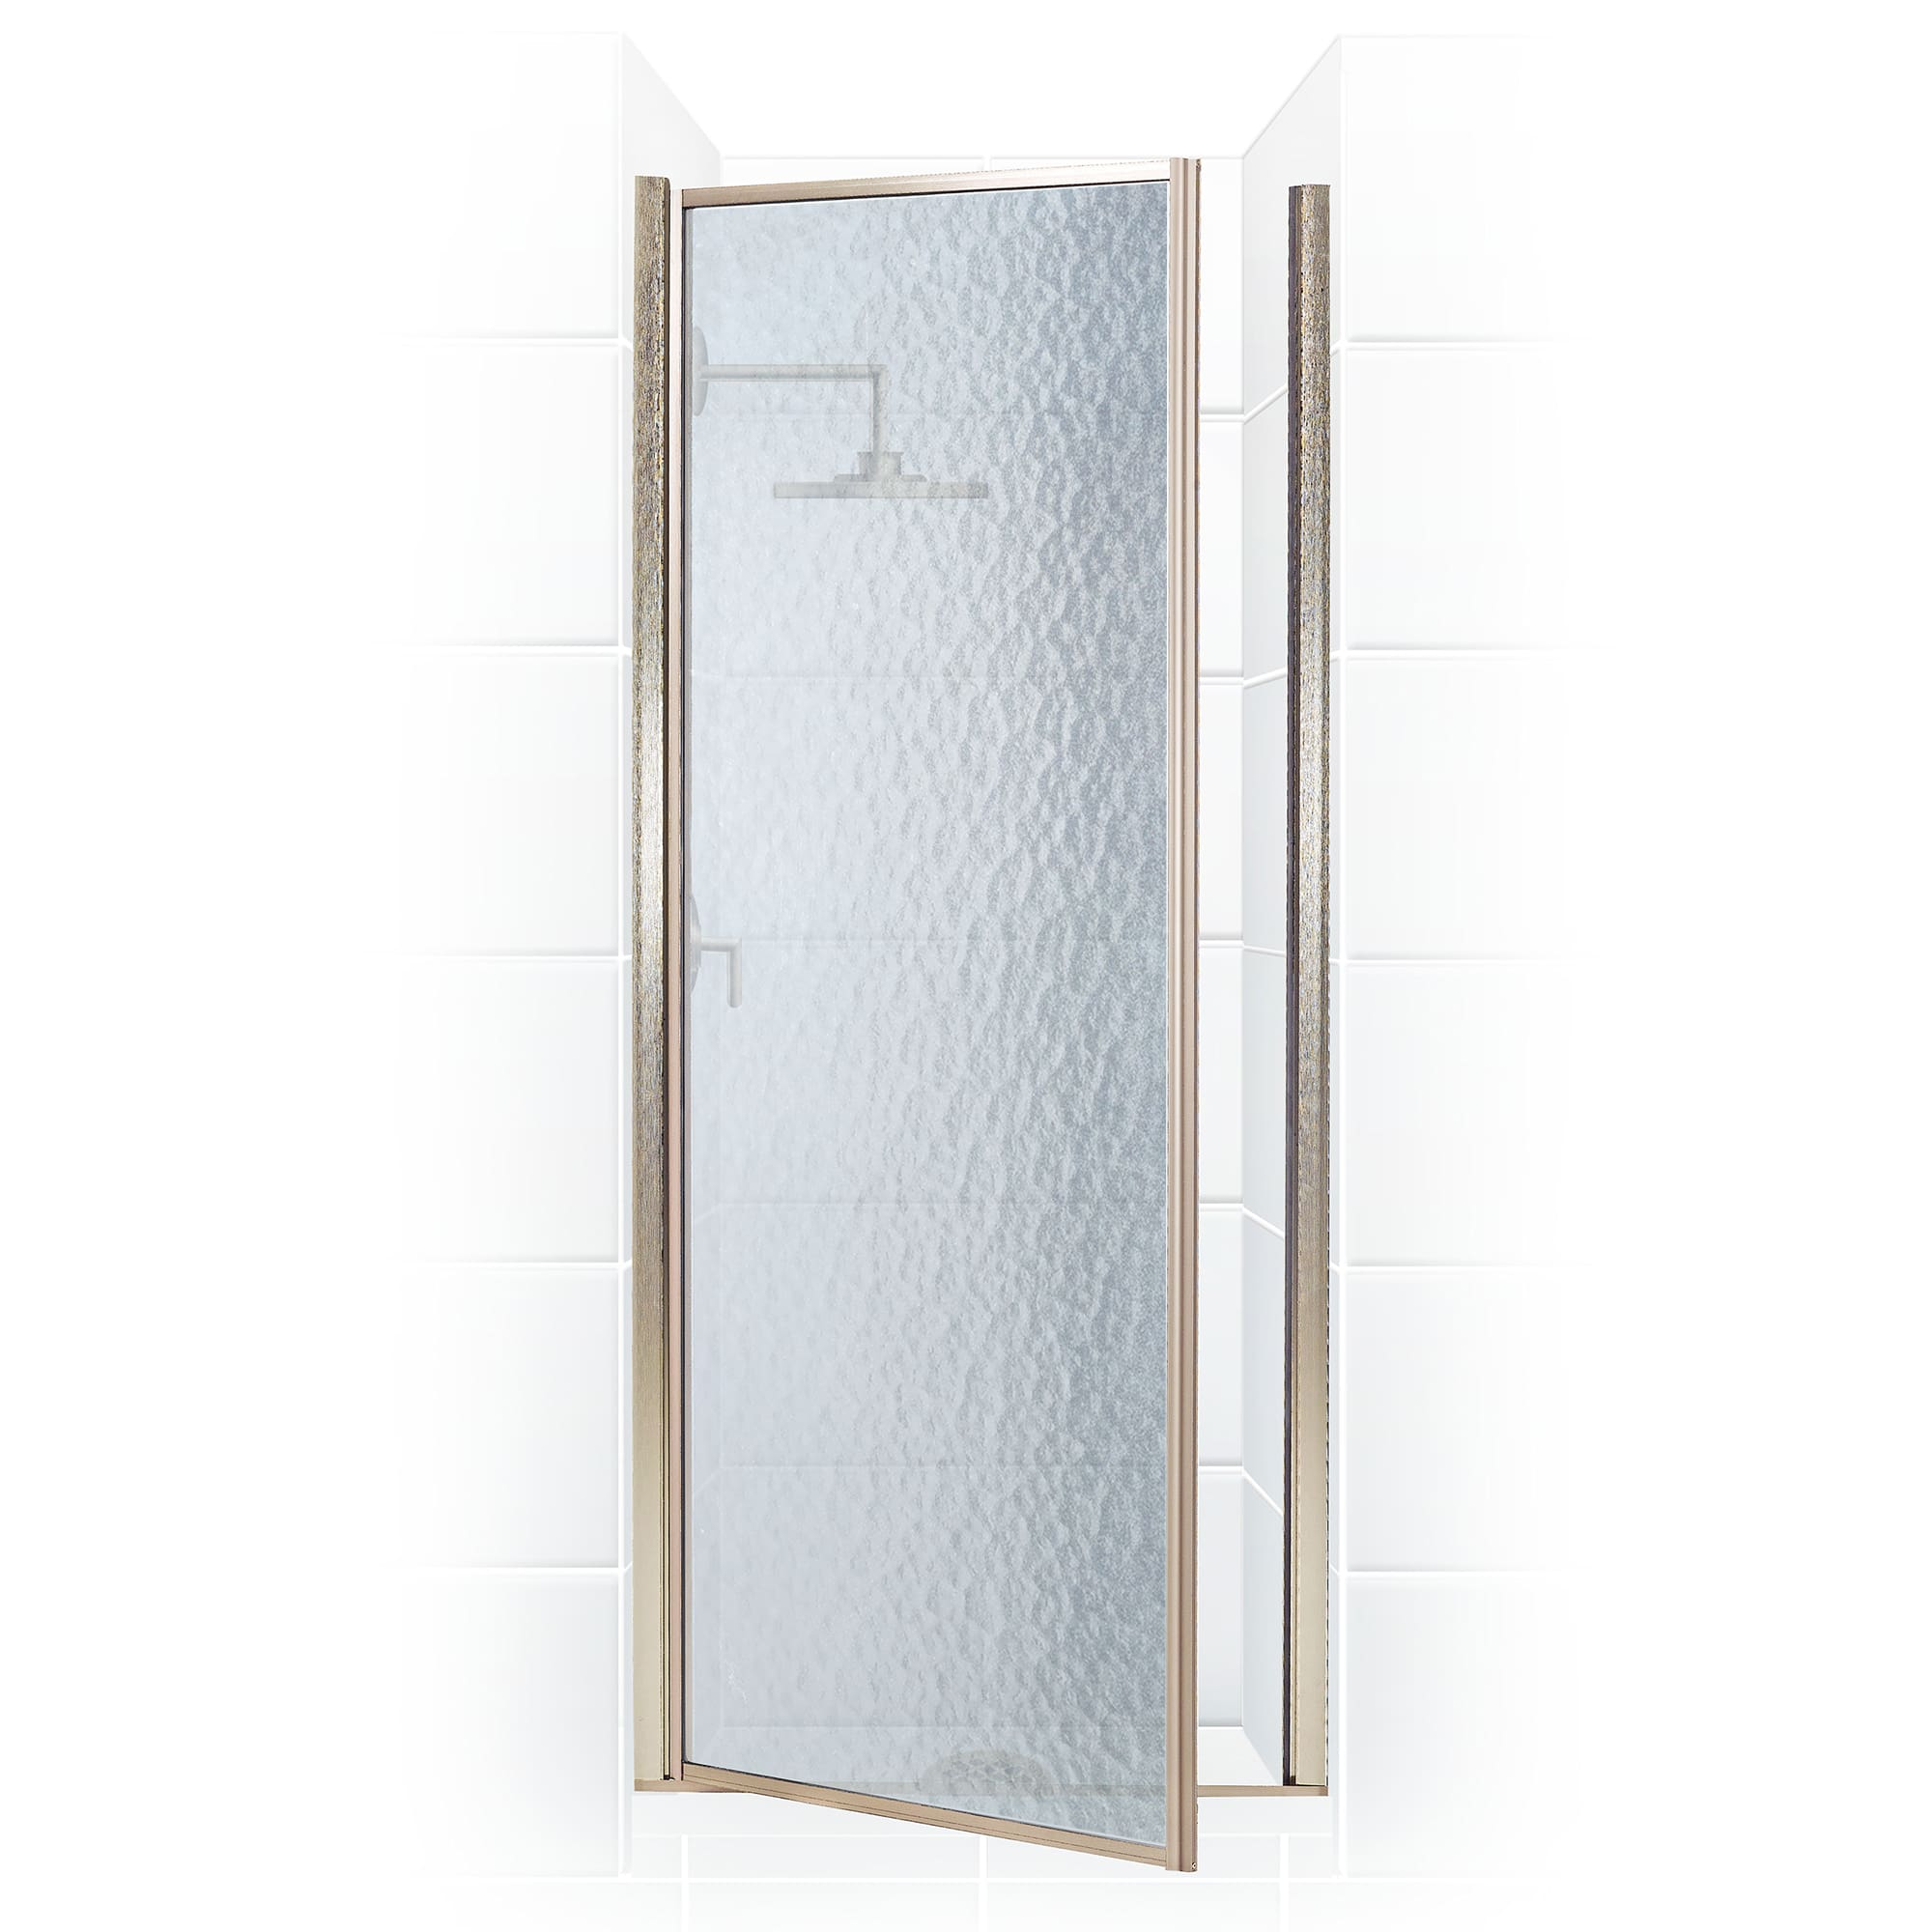 Coastal Shower Doors L32 66p A Platinum Legend Series 32 X